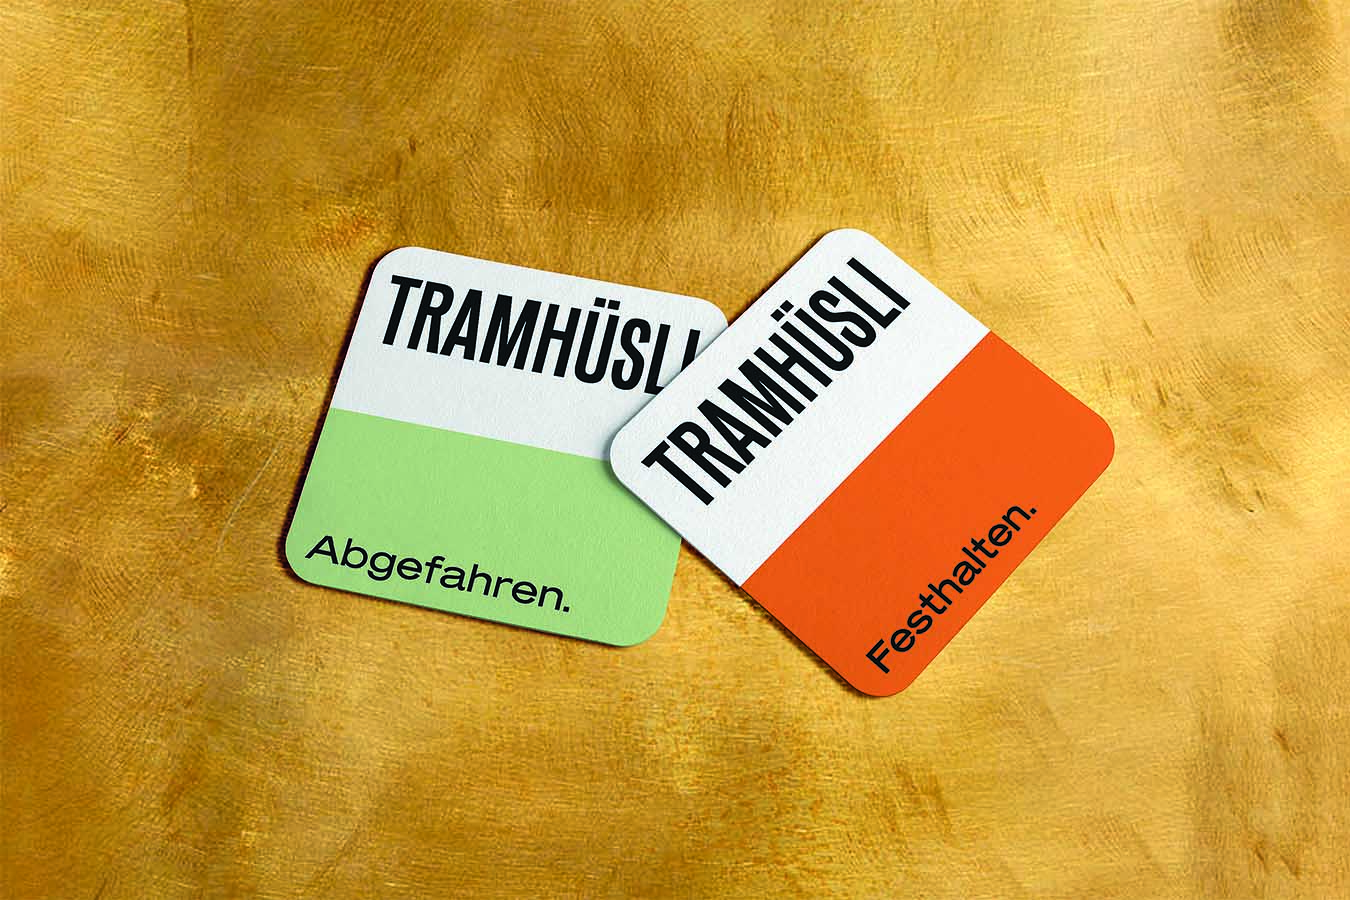 Tramhuesli Bierdeckel Corporate Design